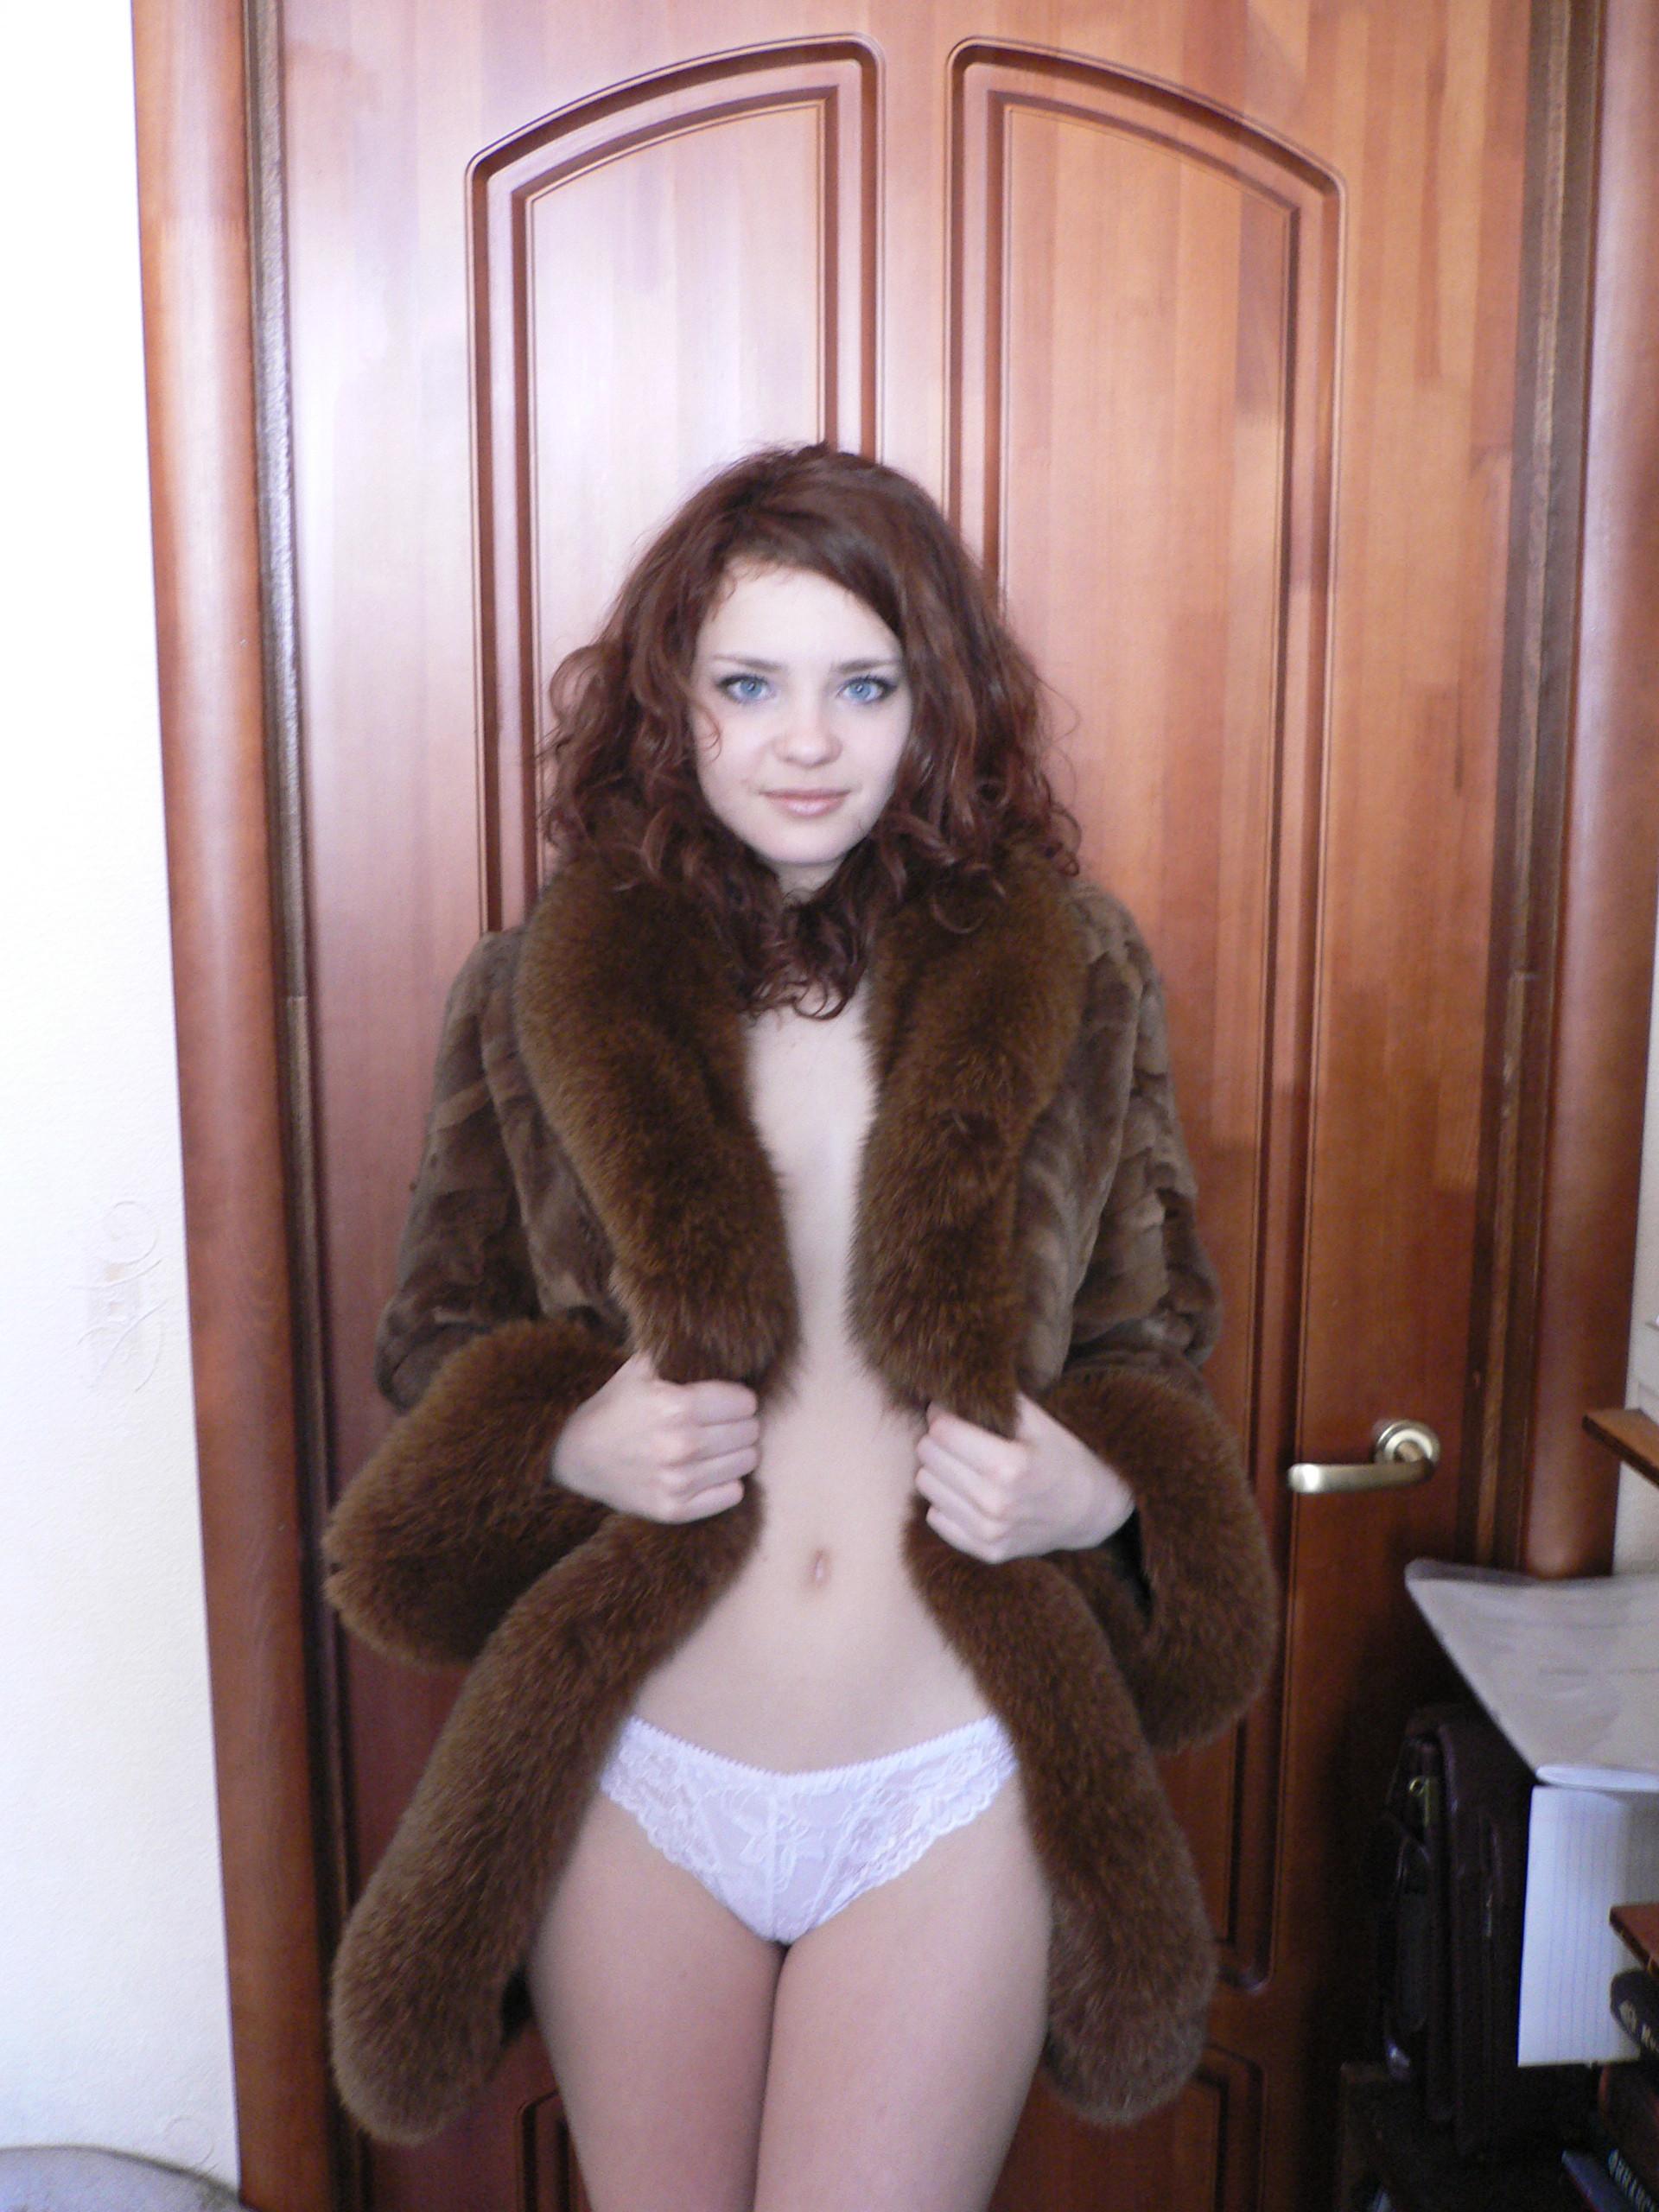 Not coat nude fur woman in what